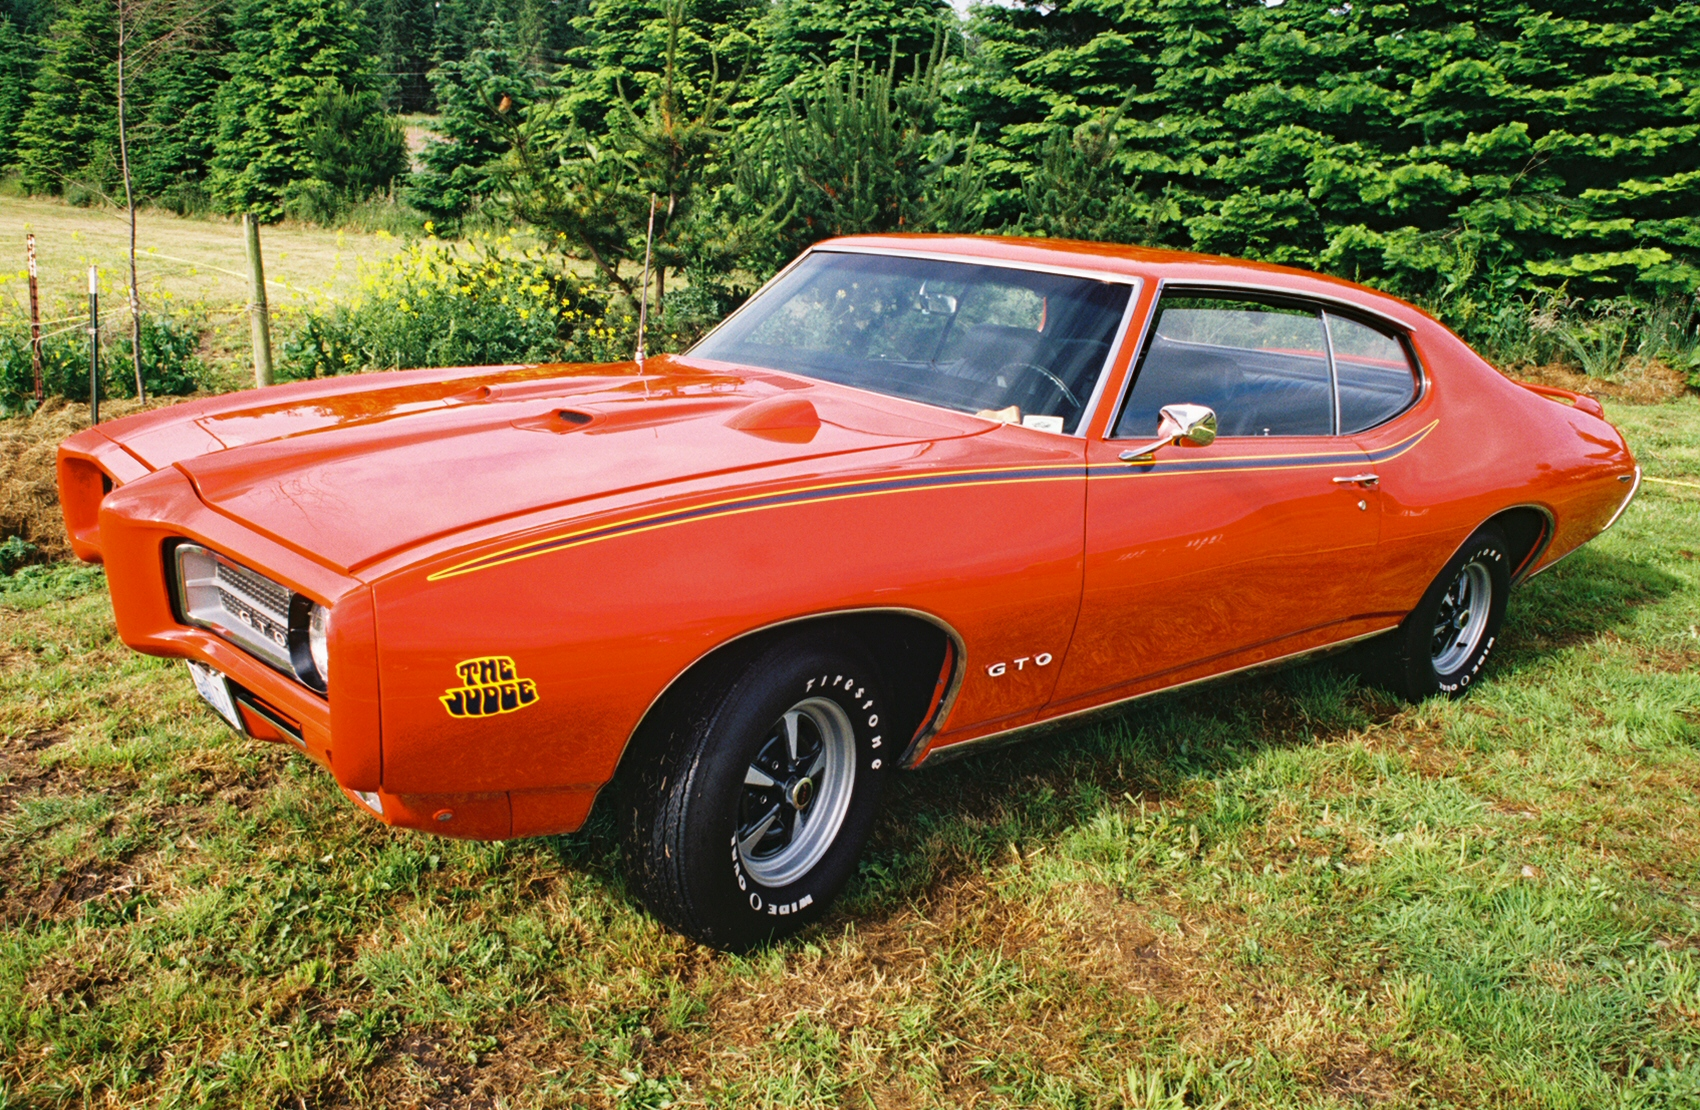 1969 Pontiac Gto Judge Wallpaper   1969 Pontiac Gto Judg Hootys blog 1700x1110